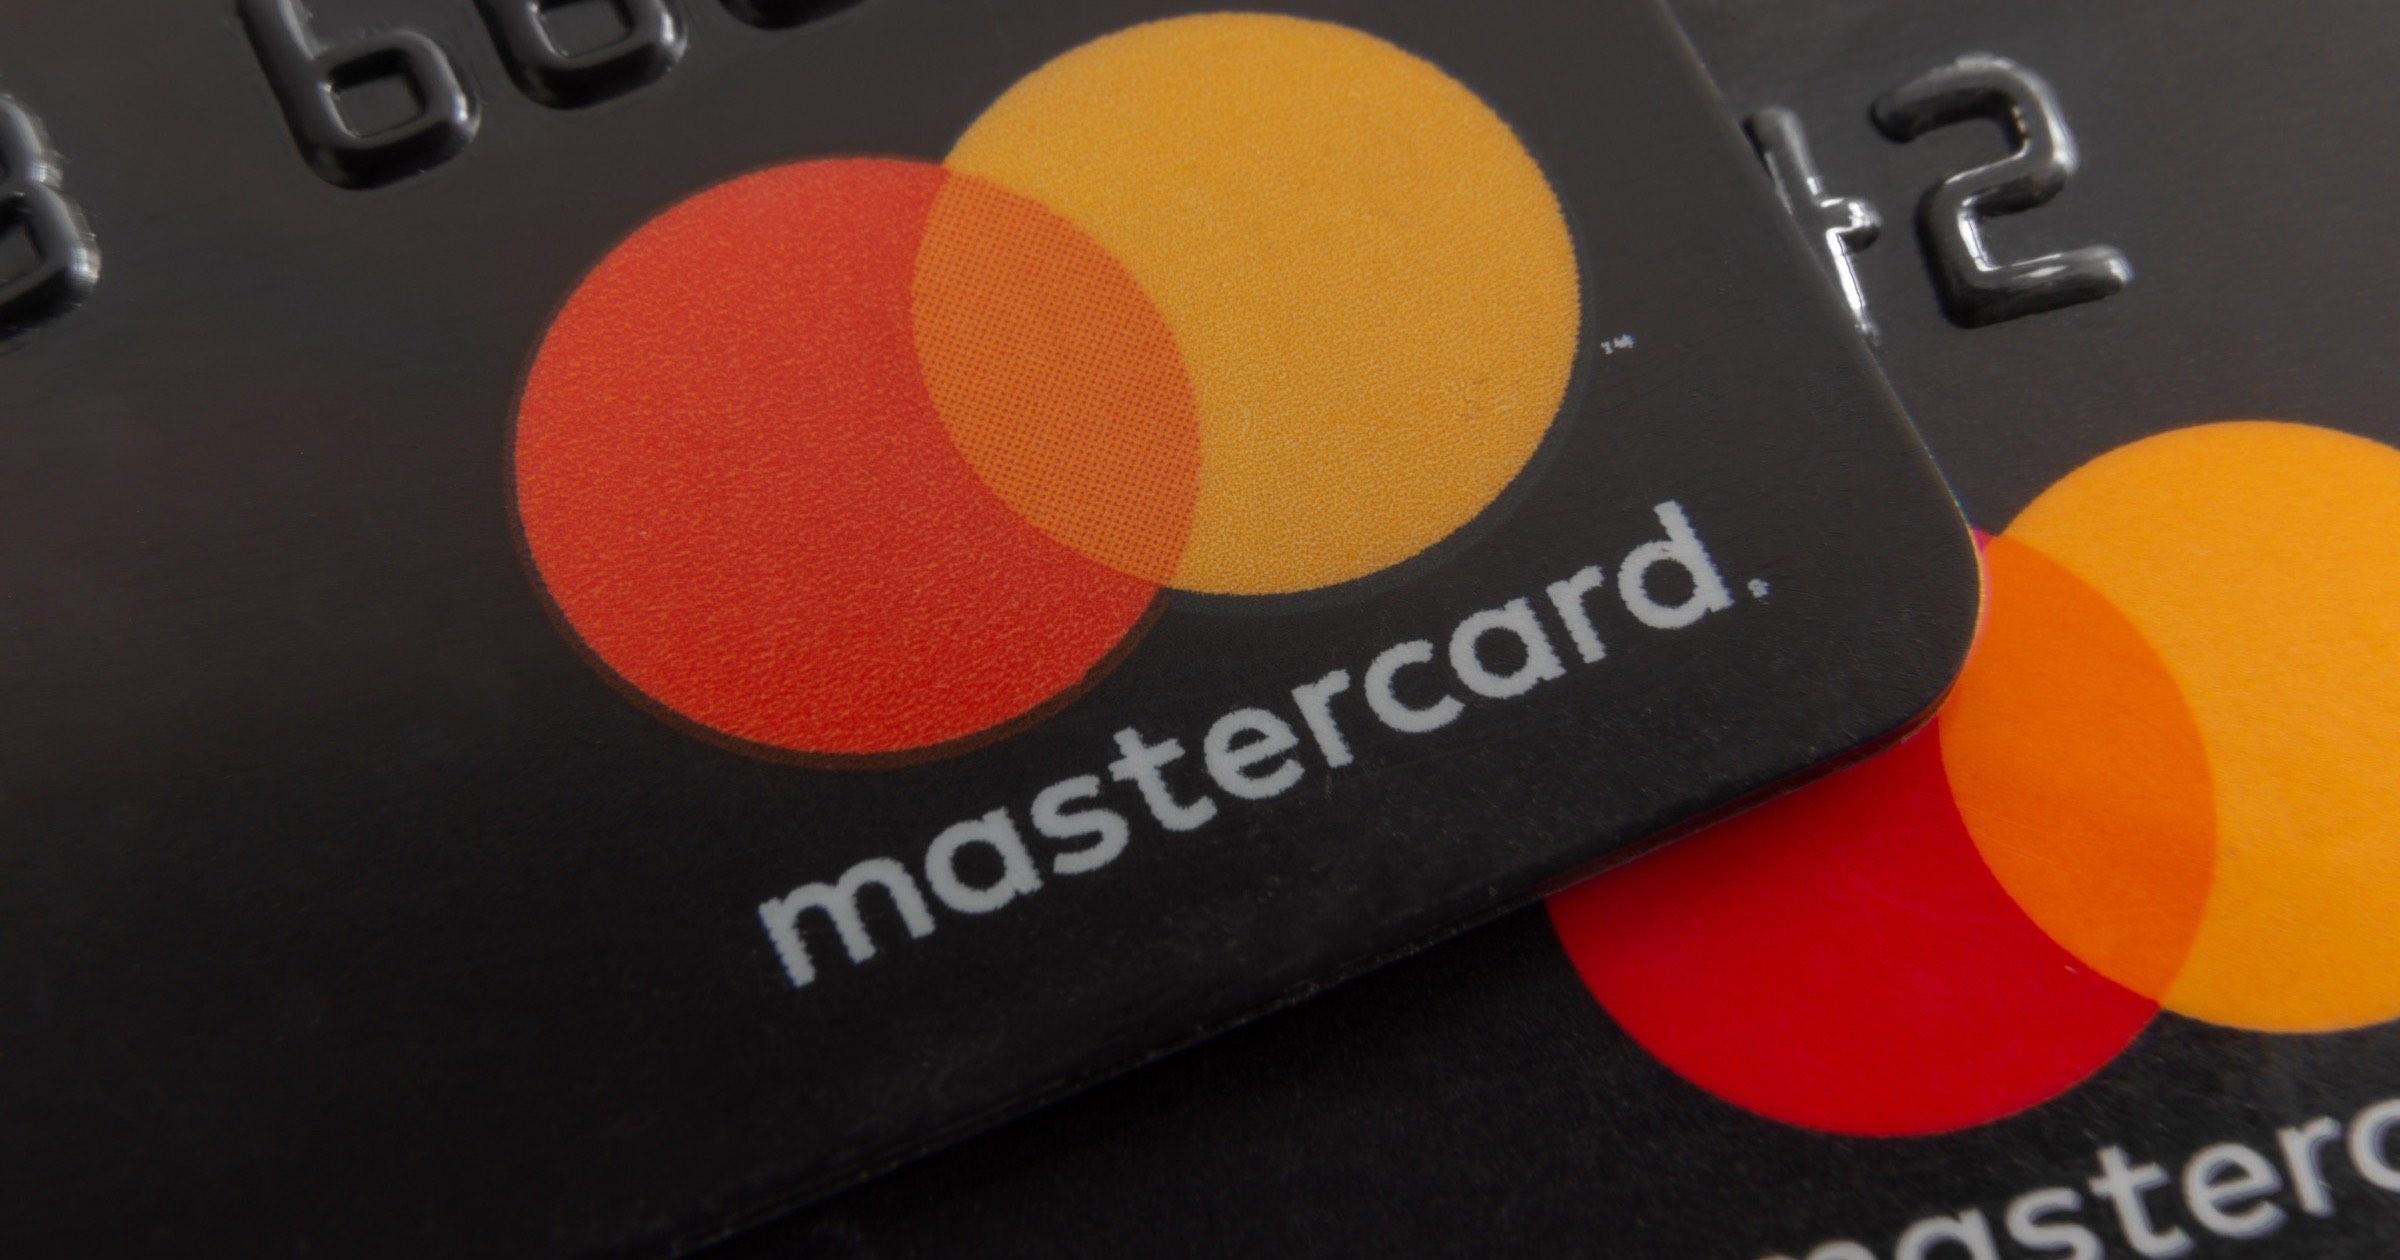 Image of a Mastercard Card